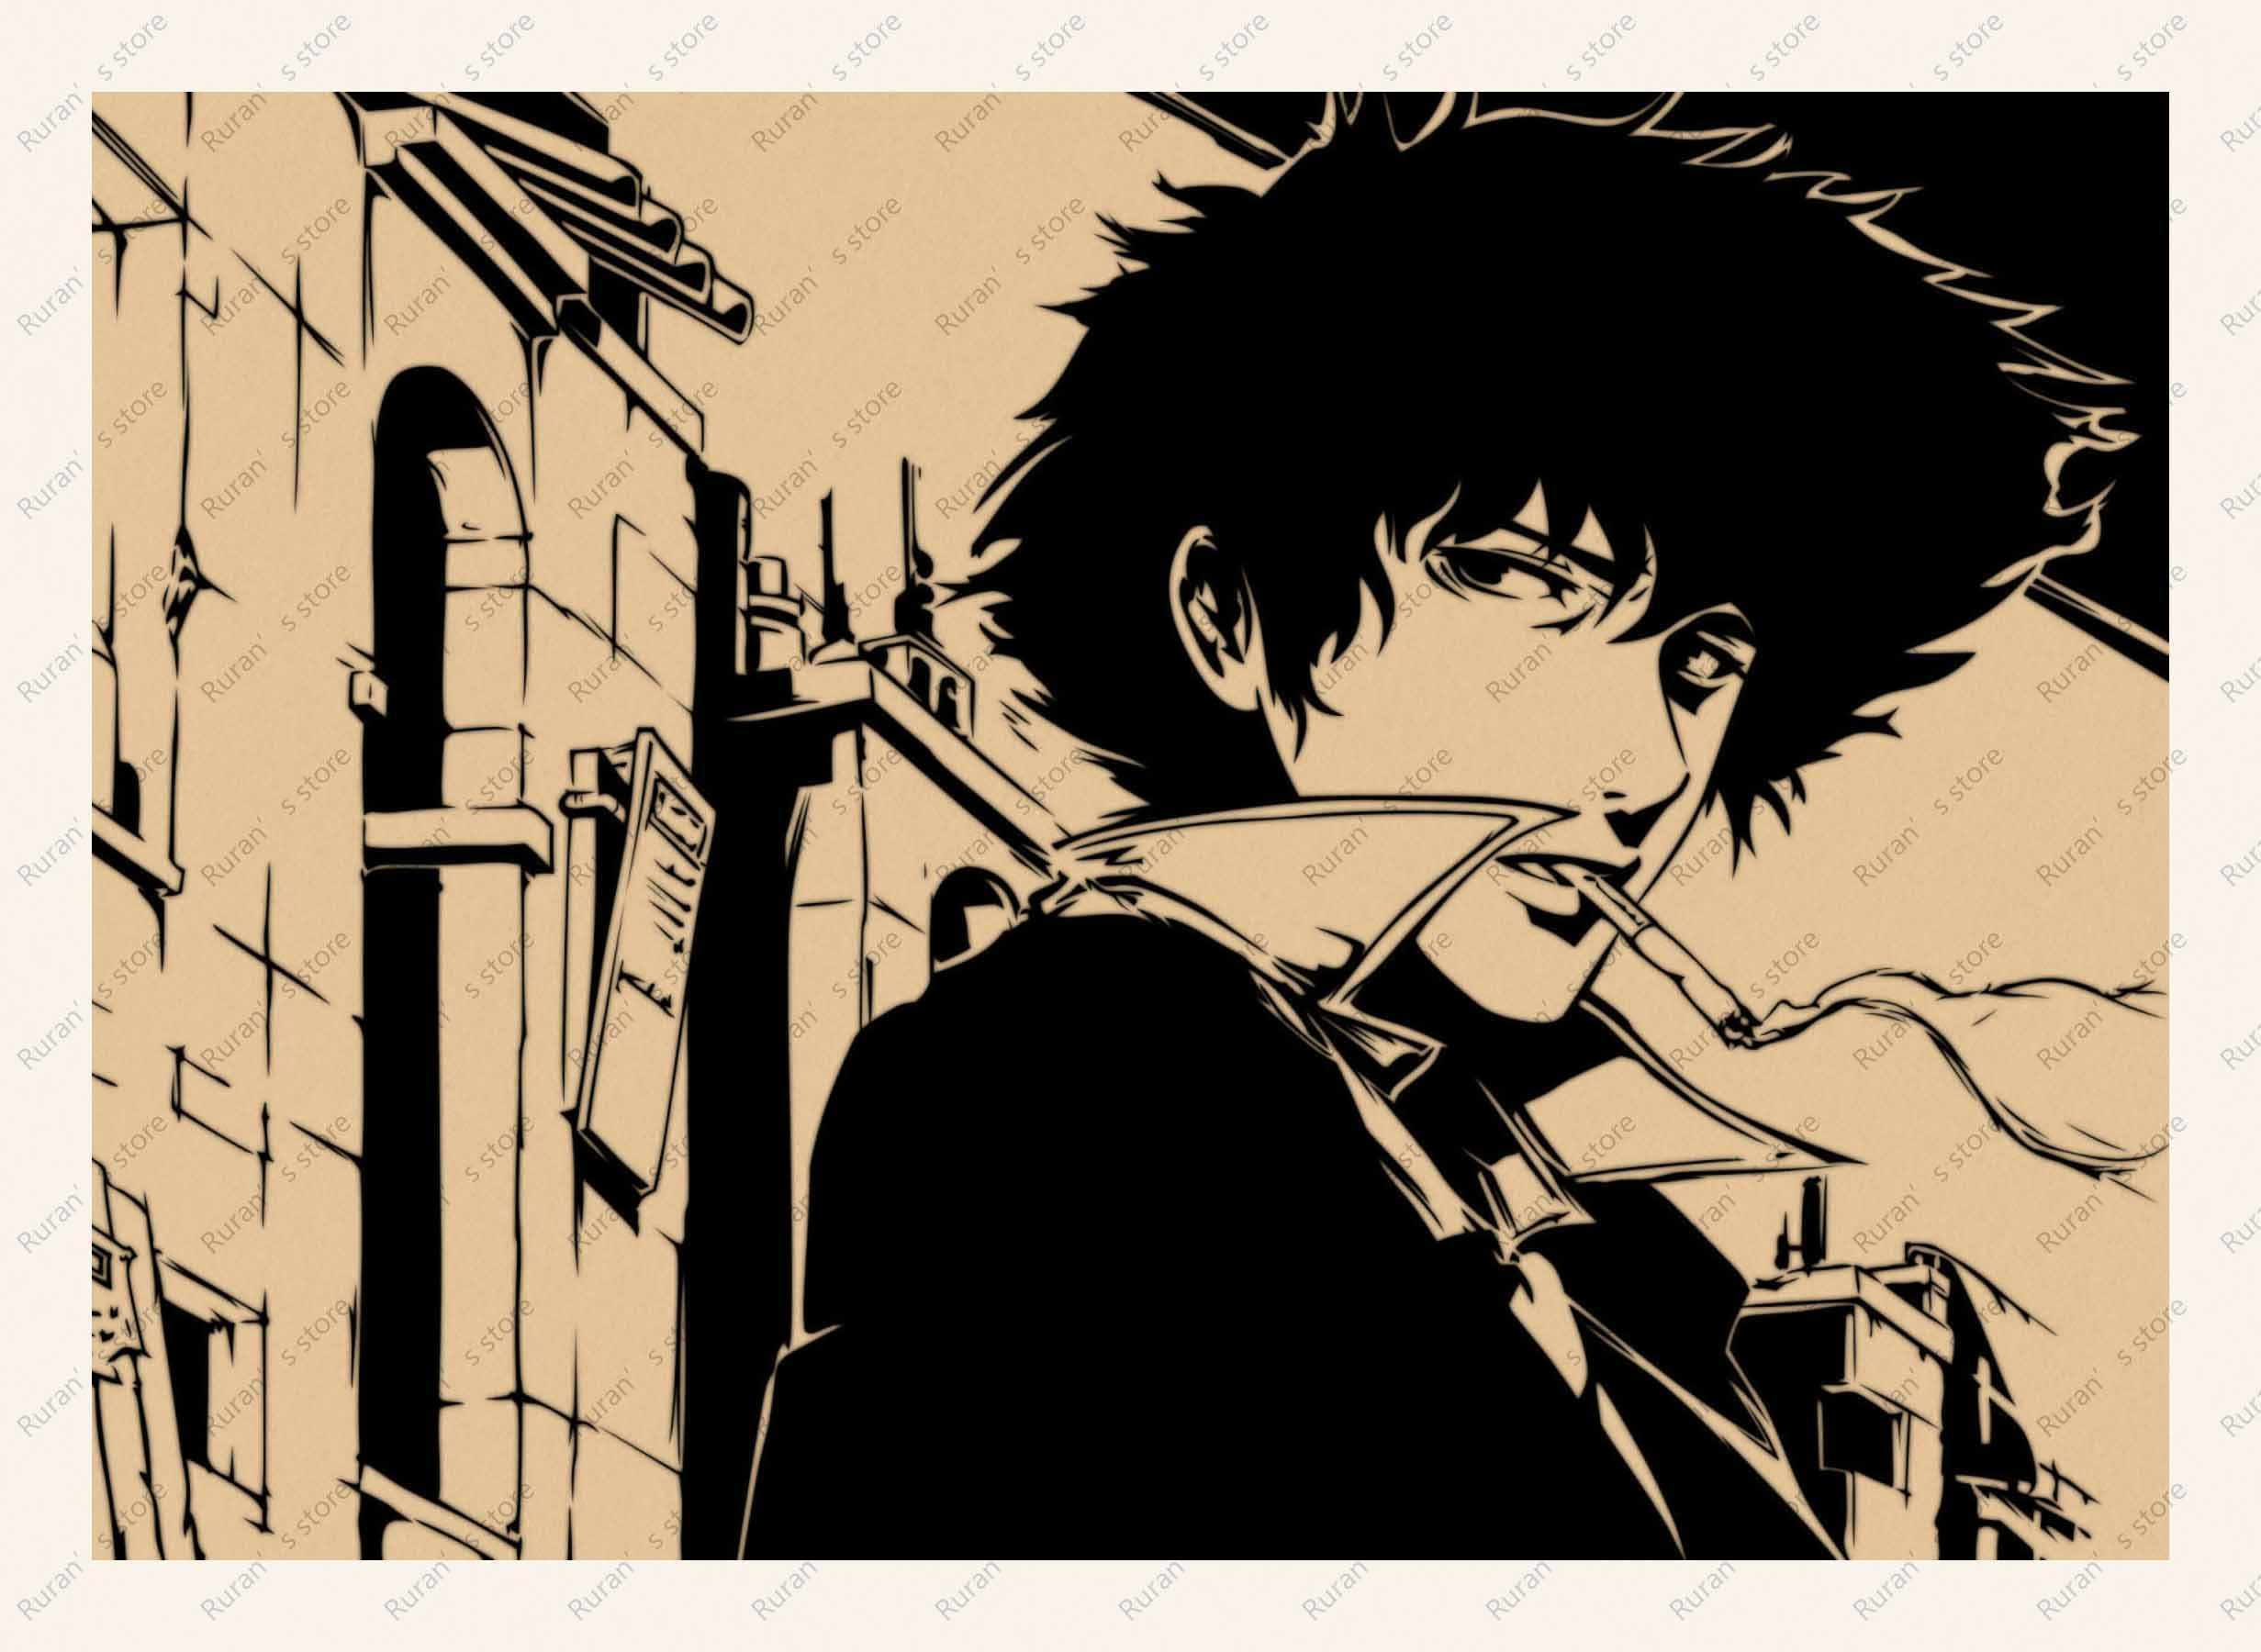 Casting... - Σελίδα 16 Cowboy-Bebop-Spike-Spiegel-Jet-Black-Faye-Valentine-Wall-sticker-Kraft-Poster-Japanese-Anime-Poster-Retro.jpg_q50